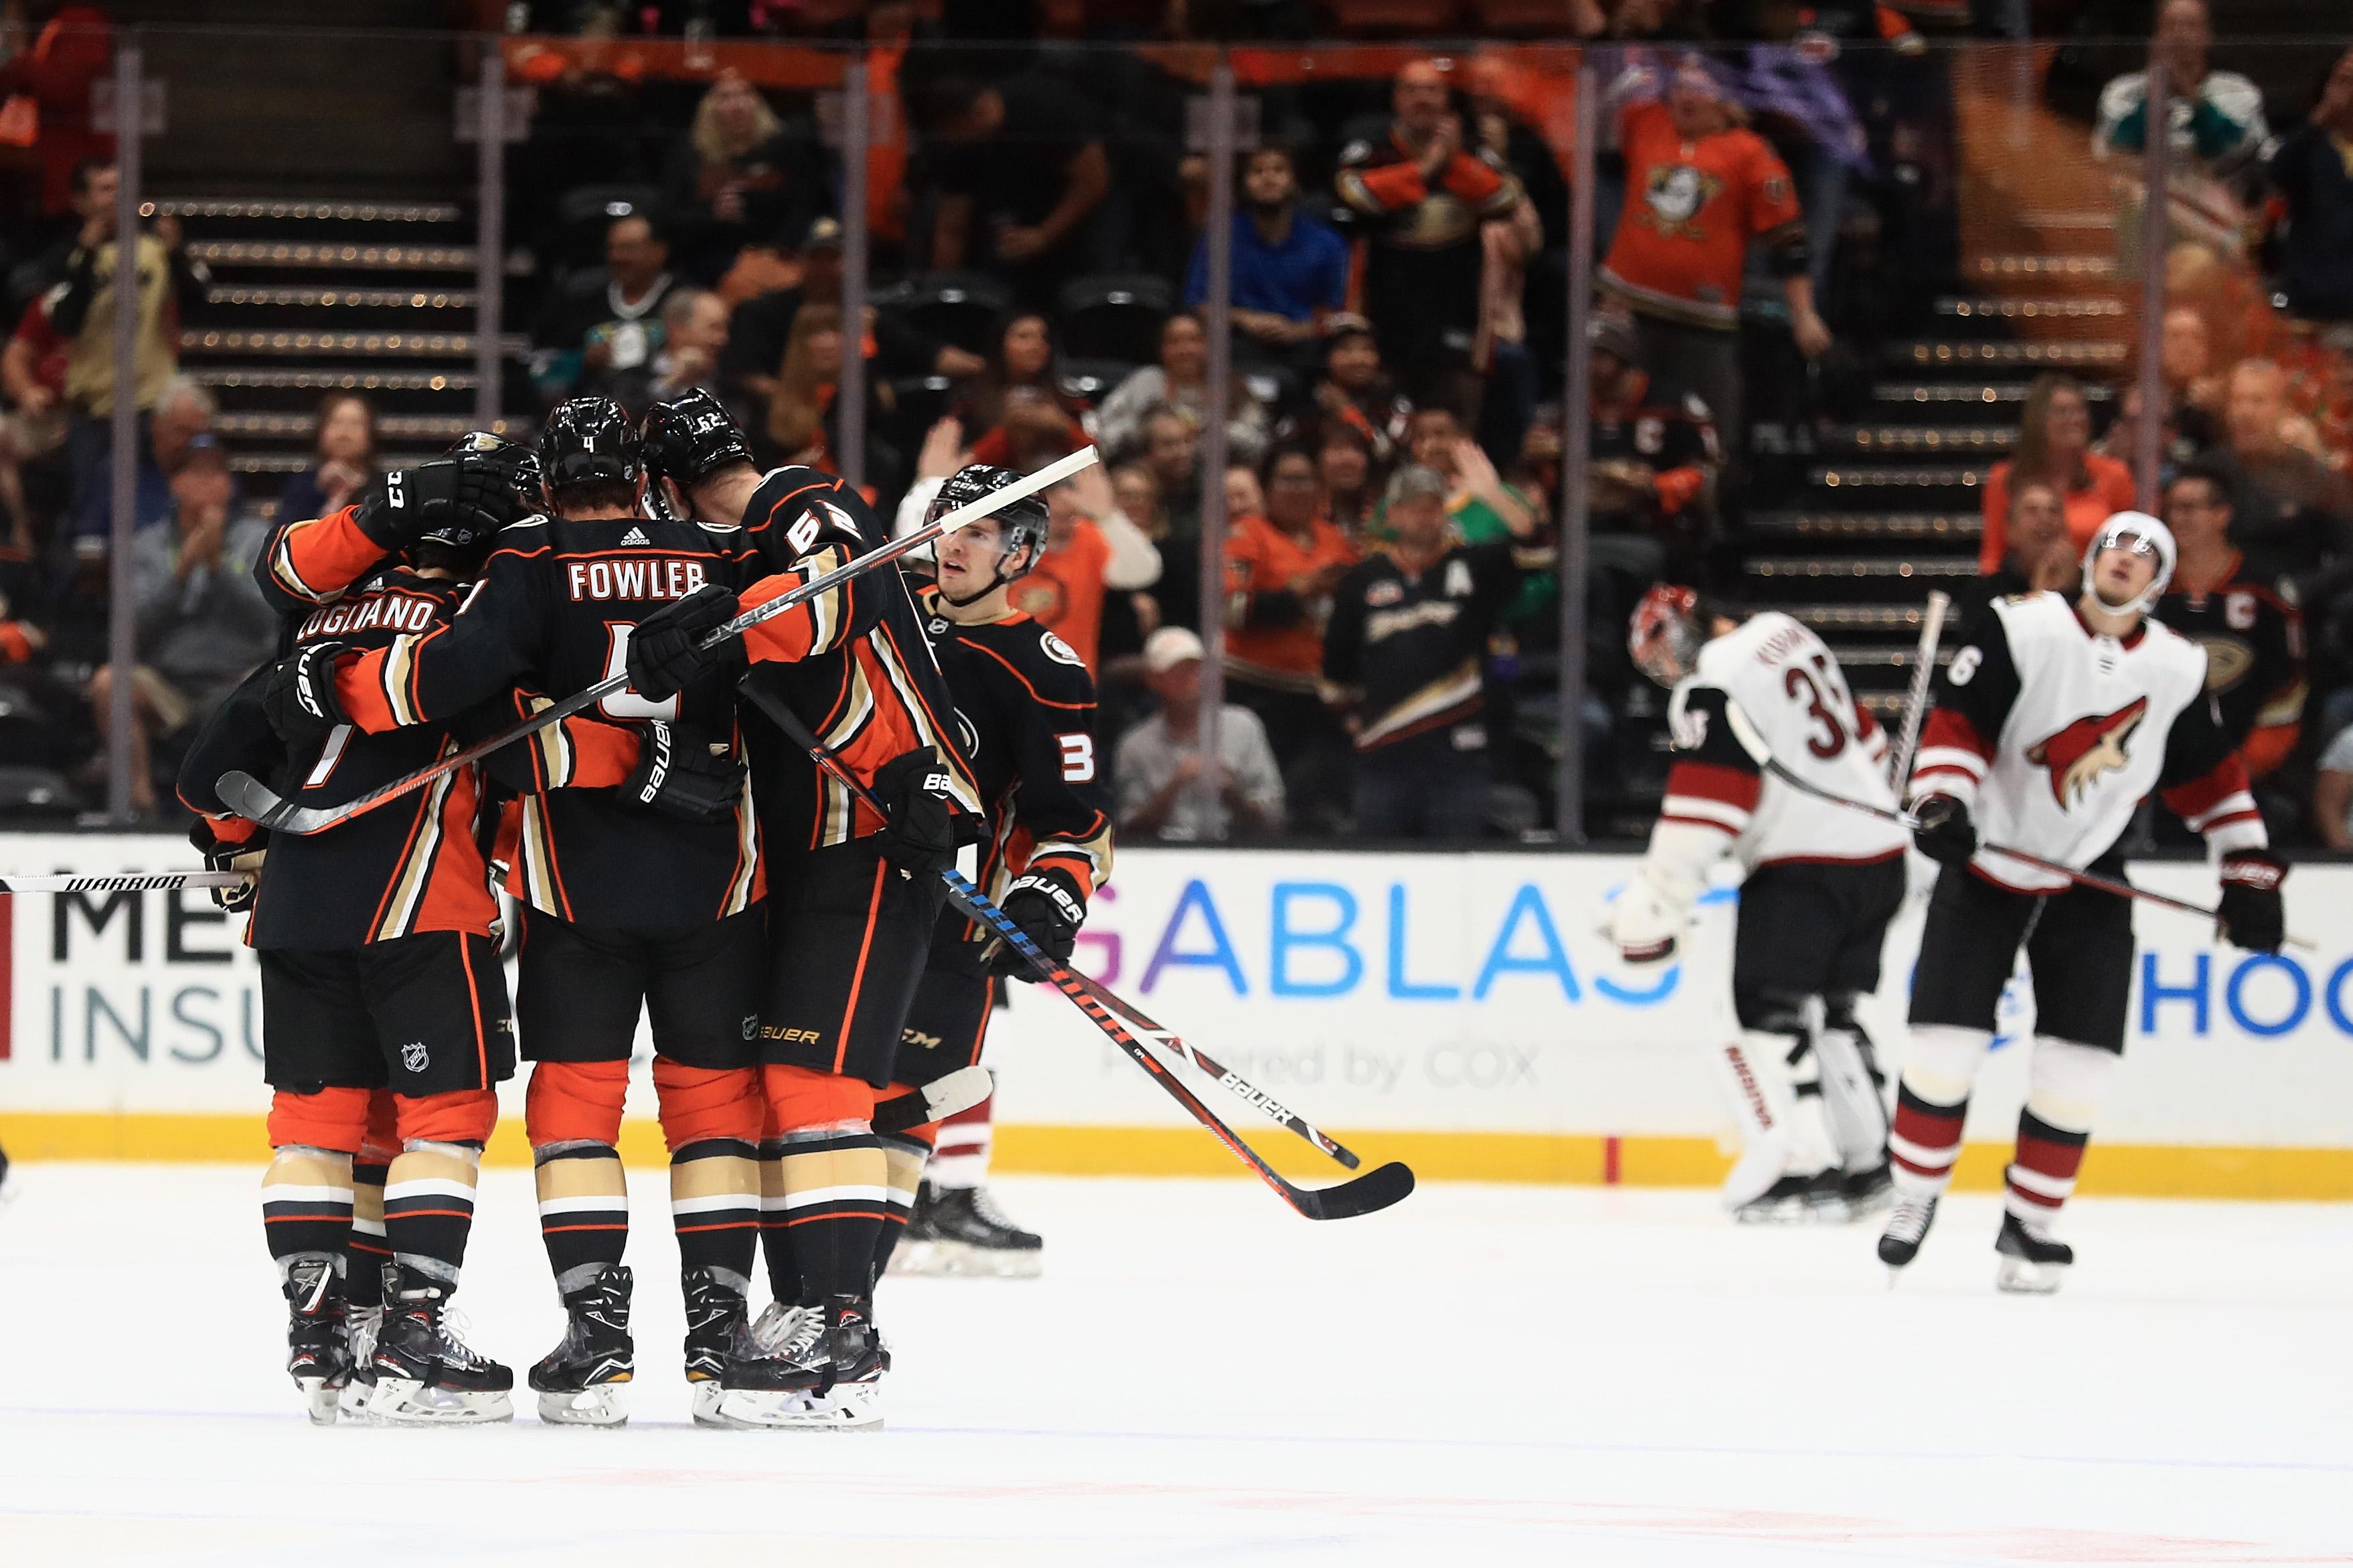 Arizona Coyotes v Anaheim Ducks